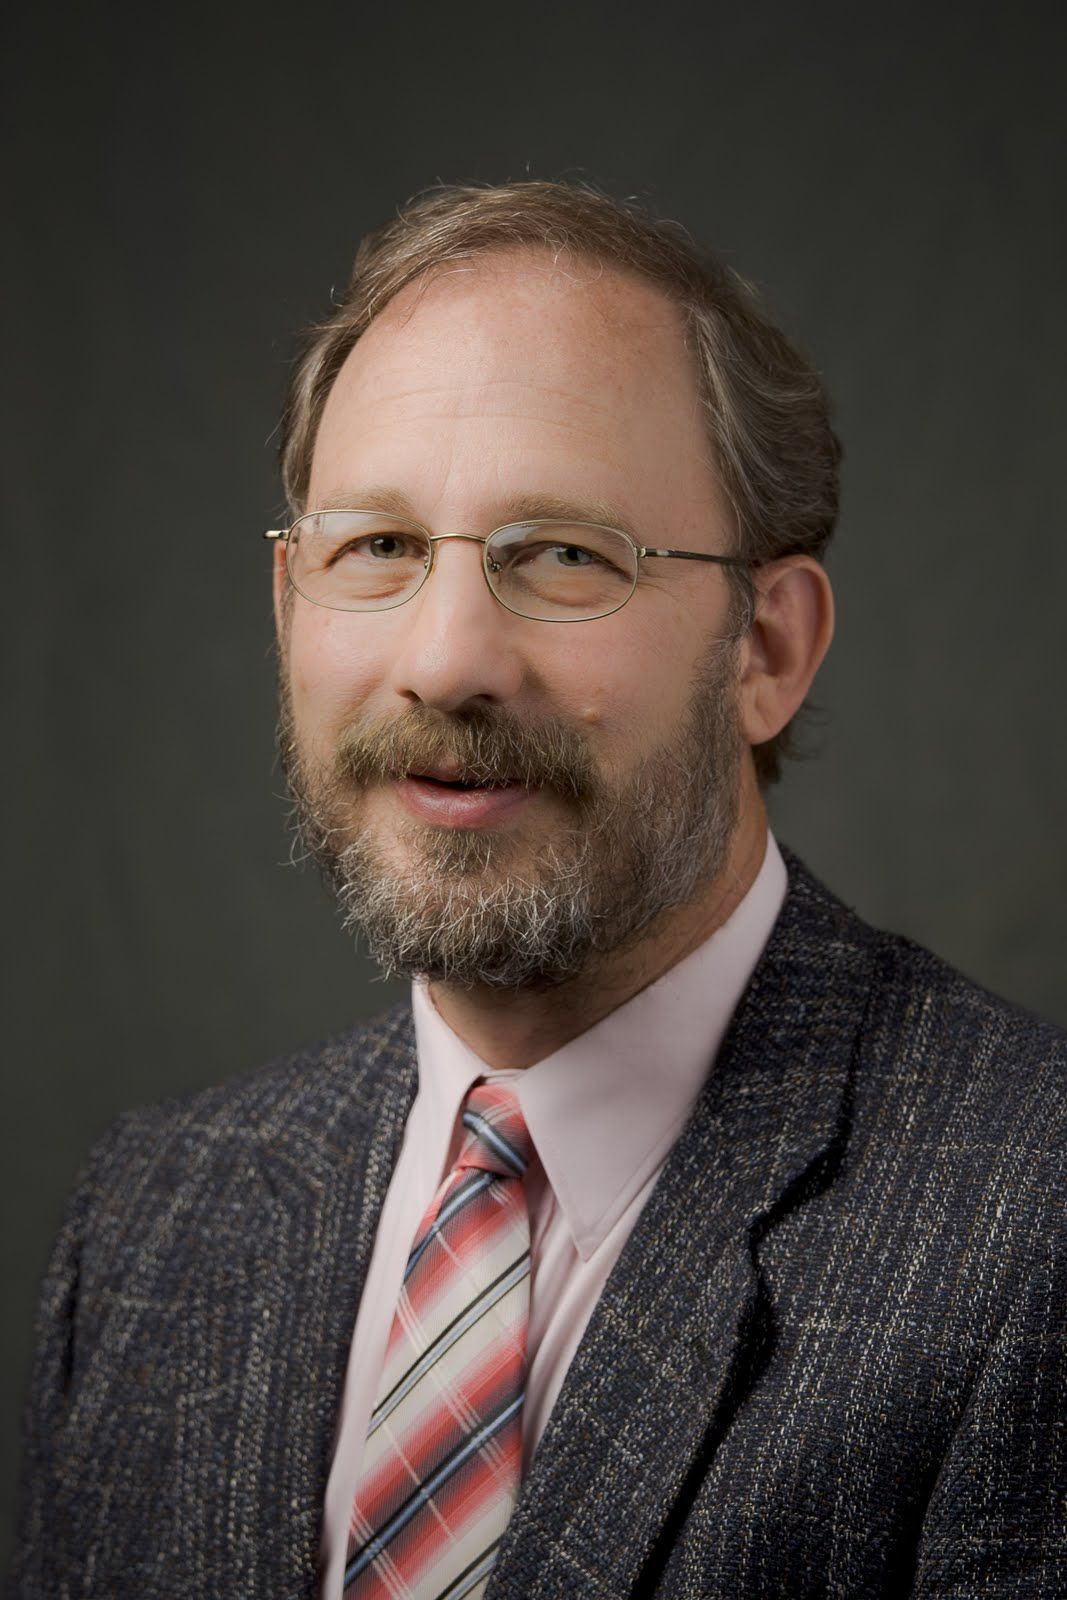 Greg Tonkay